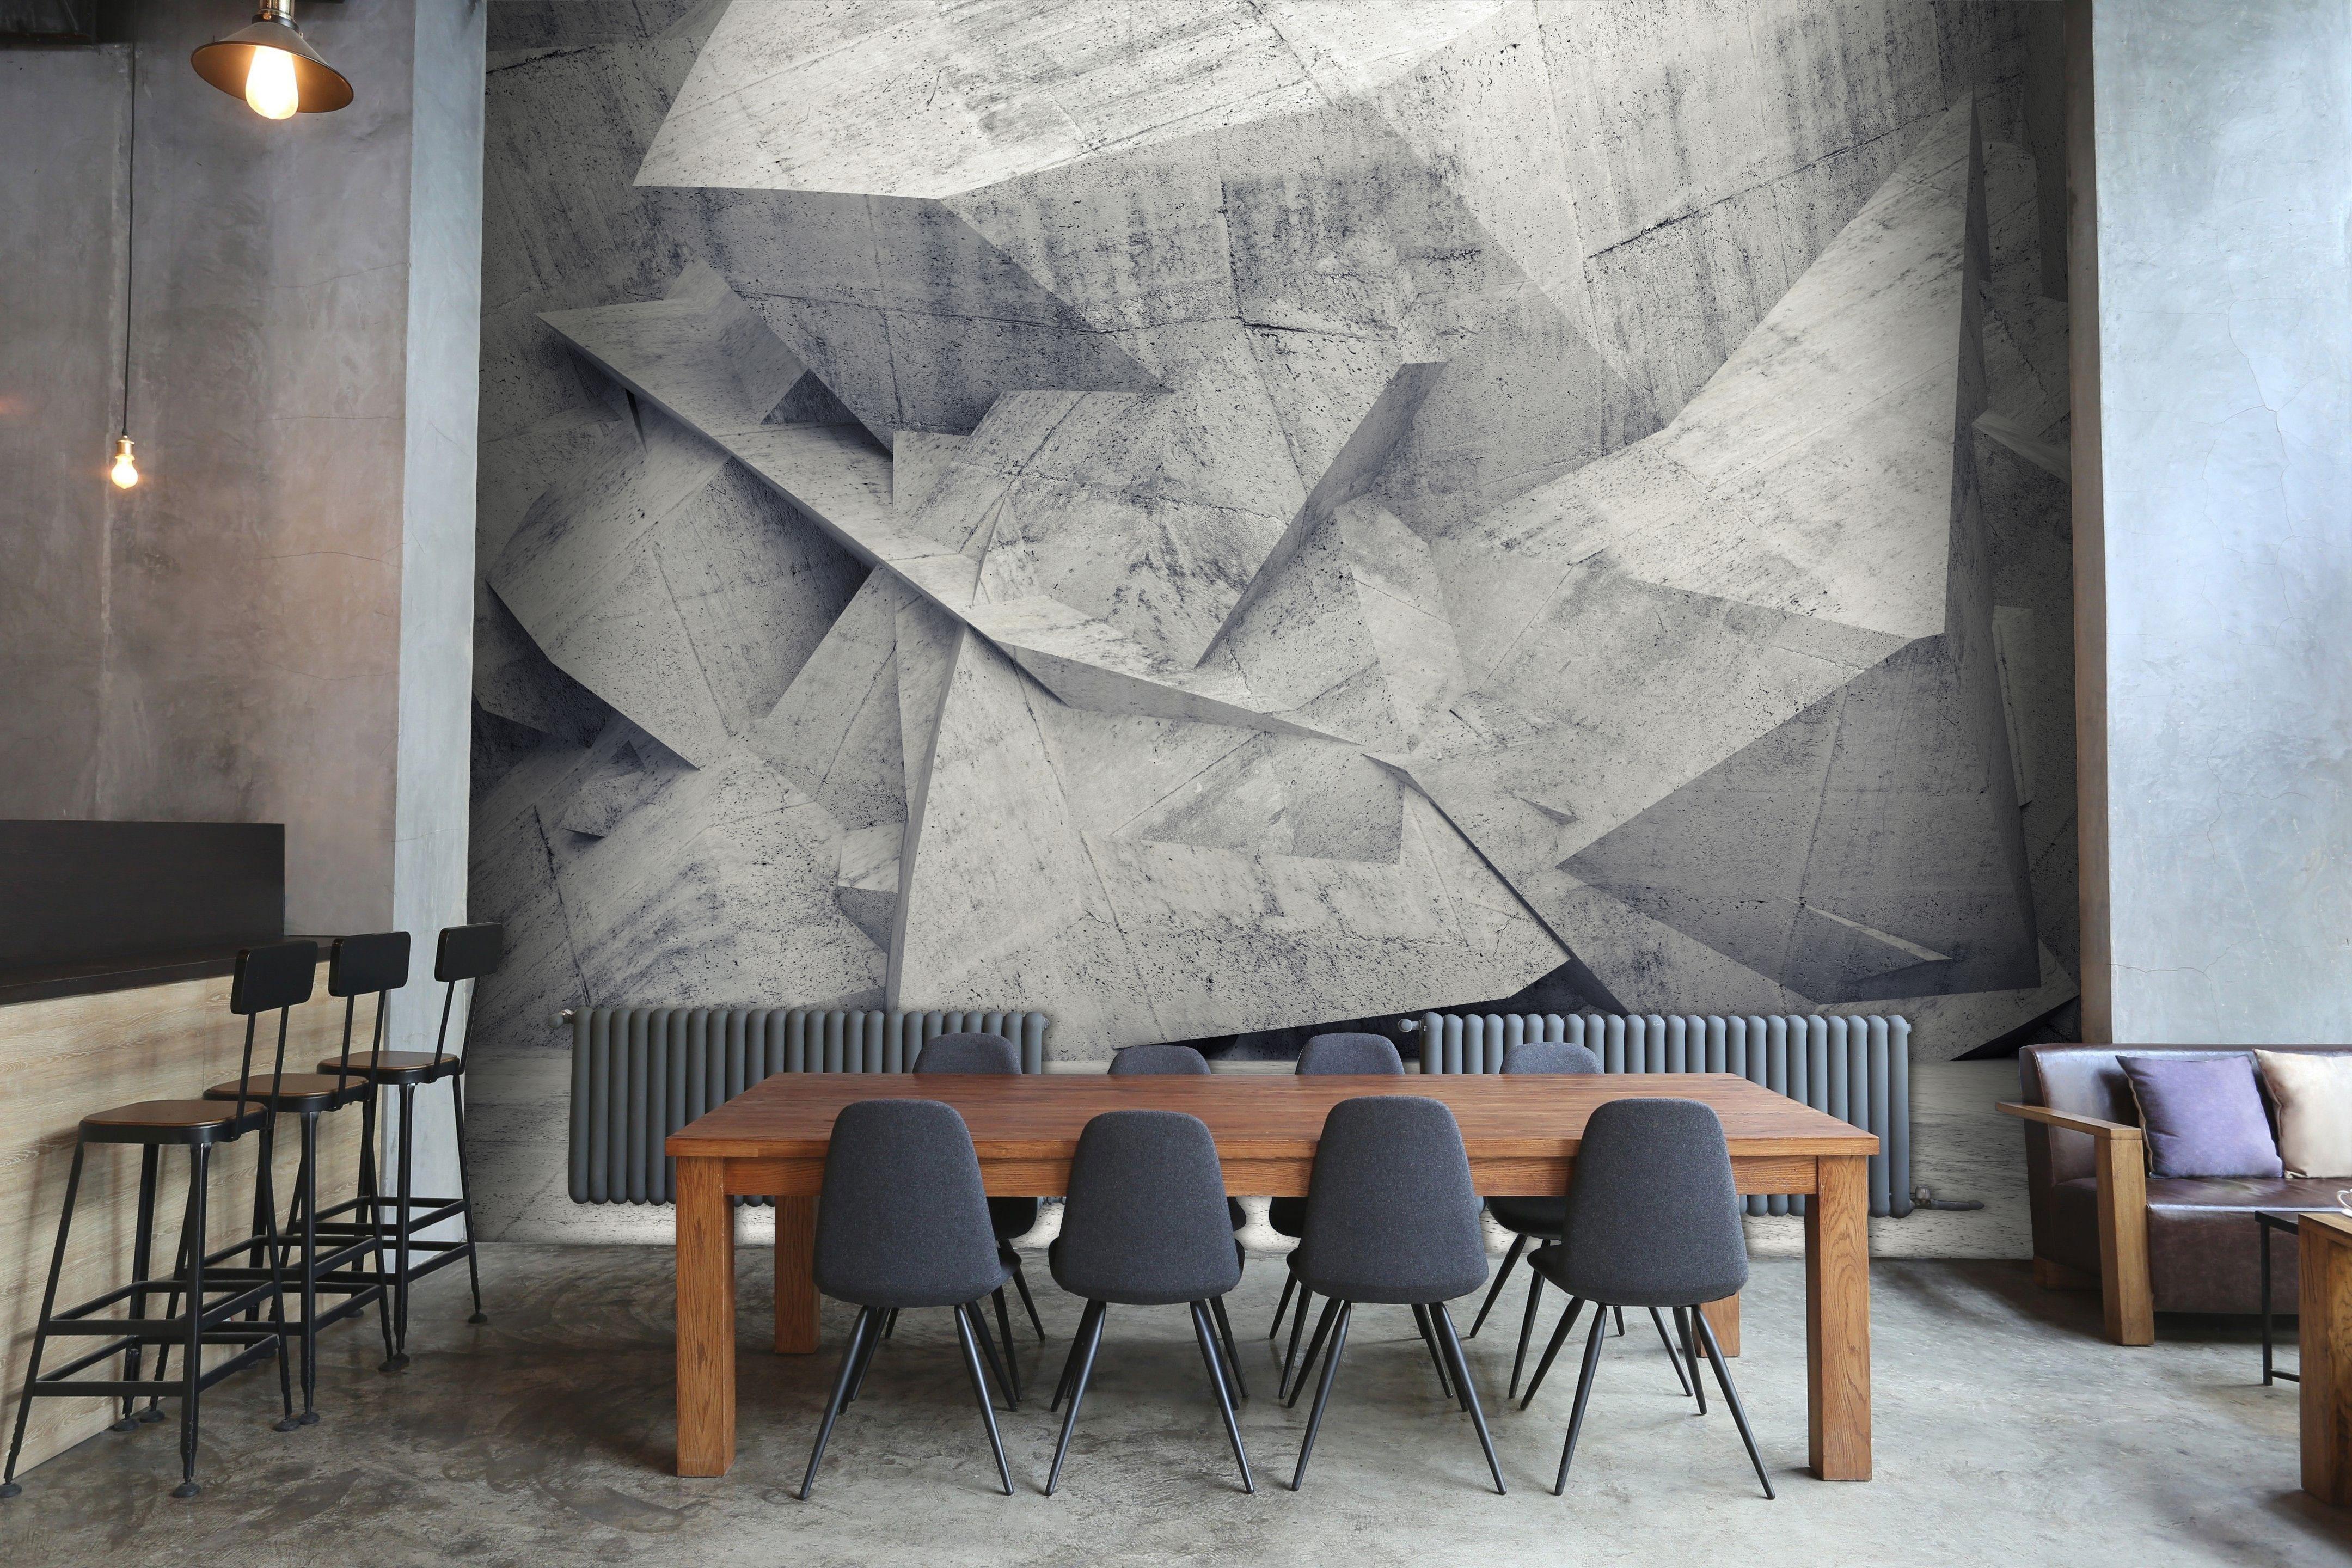 10 Decorating Strategies Every Loft Apartment Needs